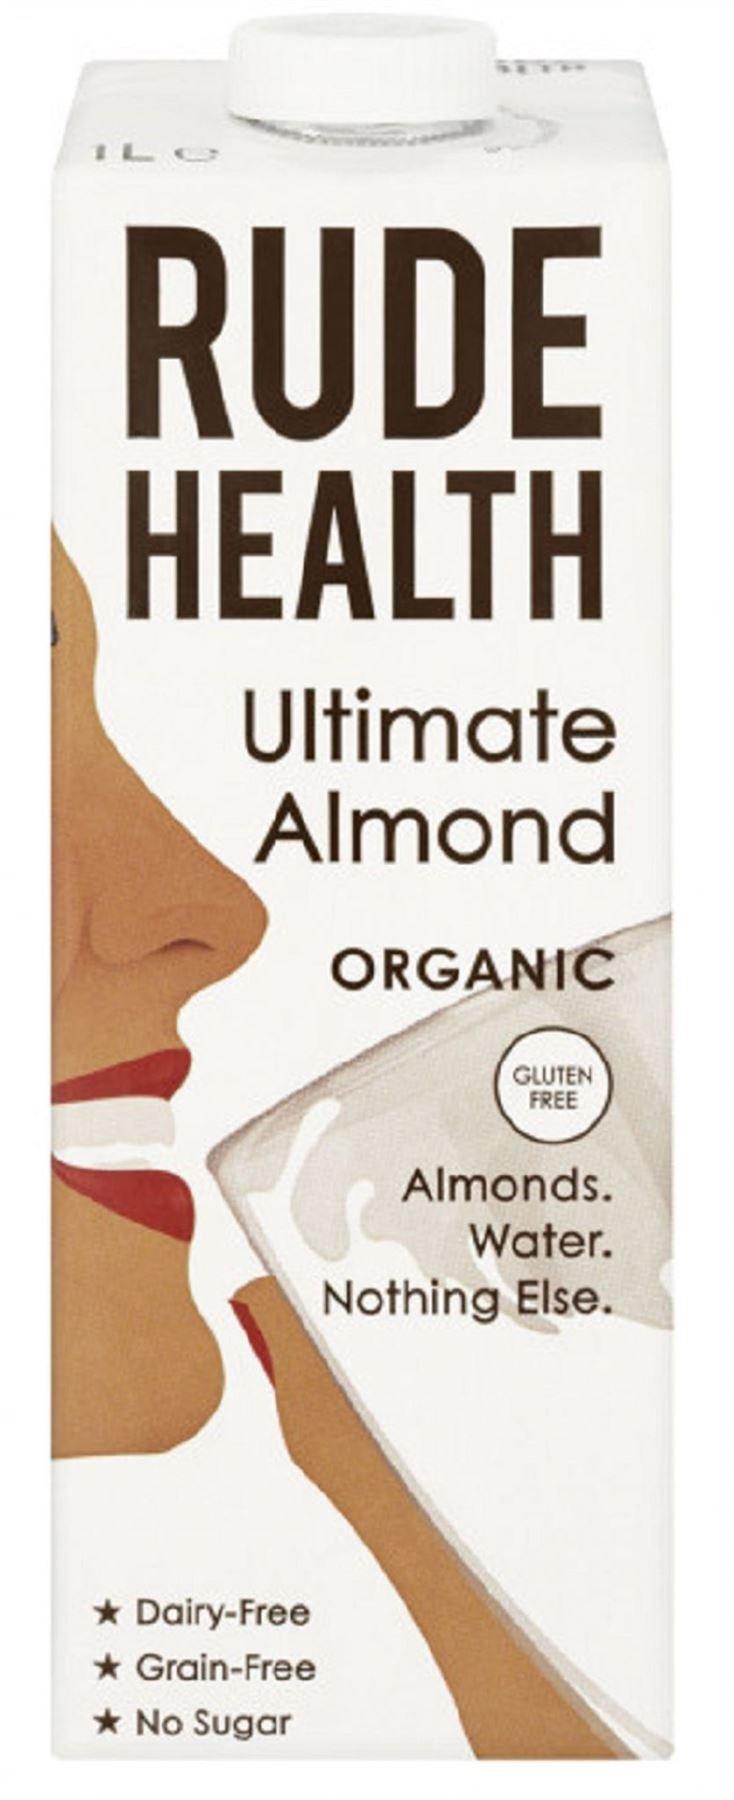 Rude Health Organic Almond Milk 1ltr